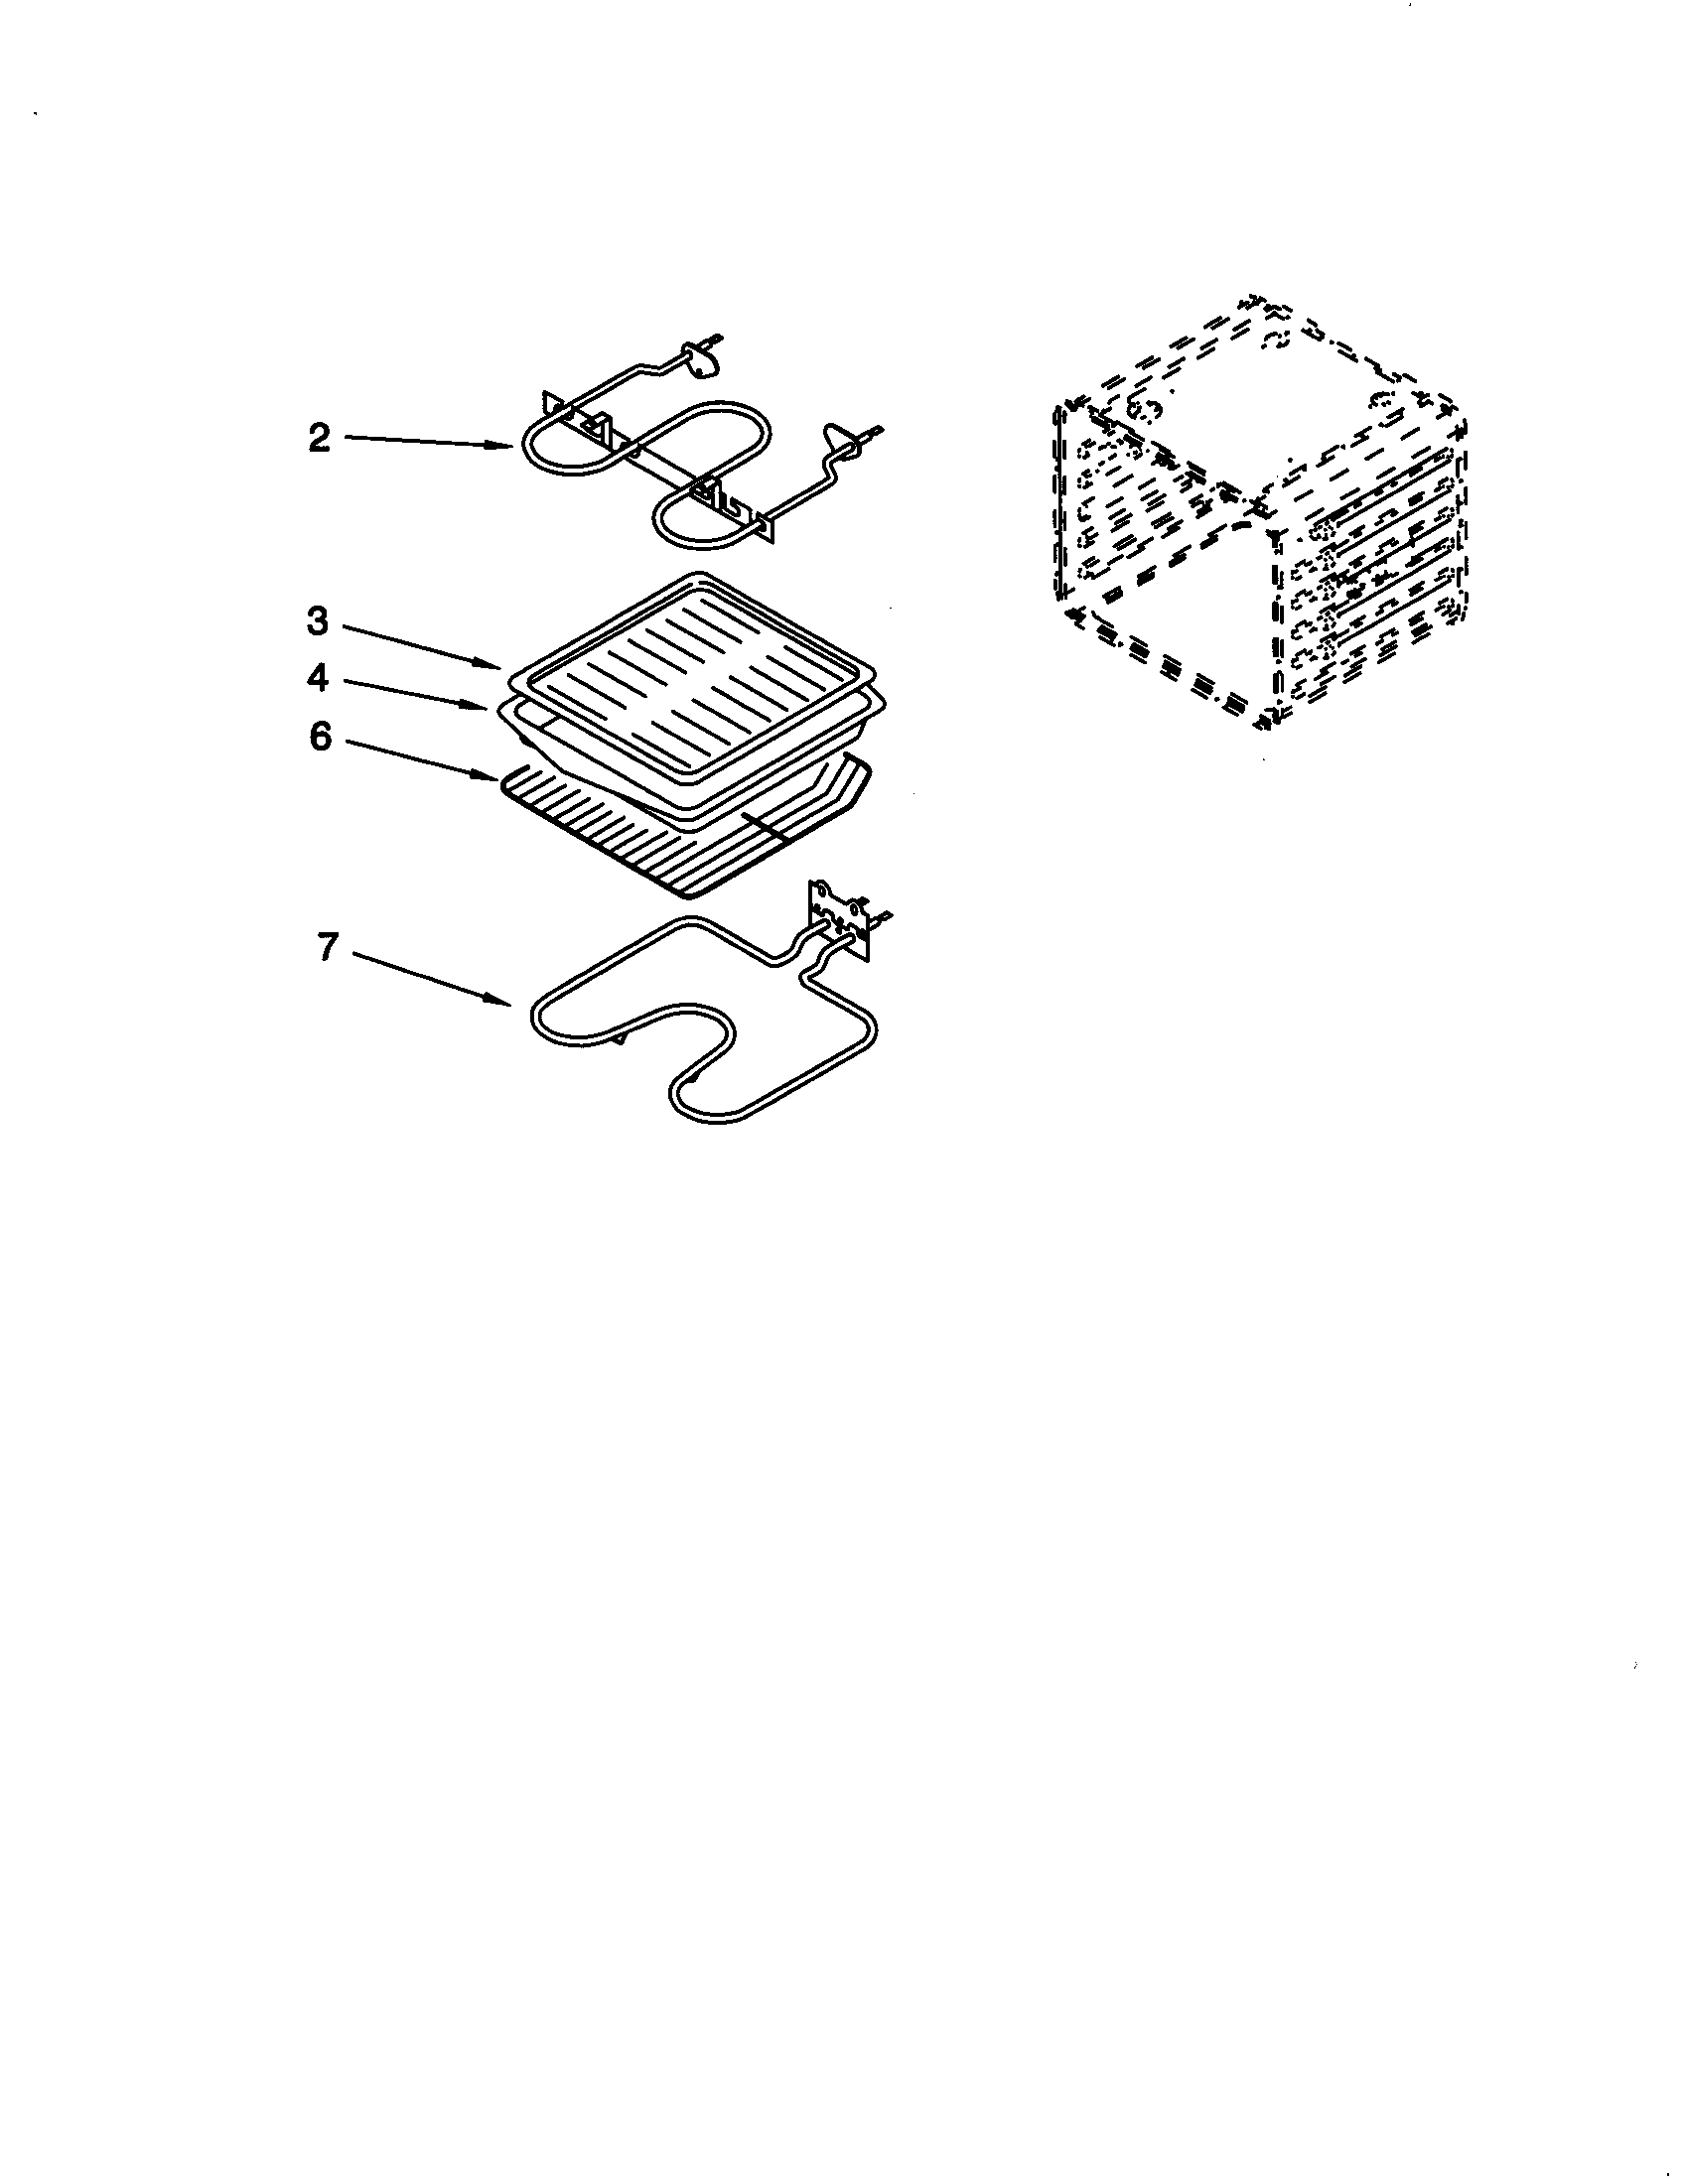 Whirlpool Rs675pxgq0 Electric Range Timer